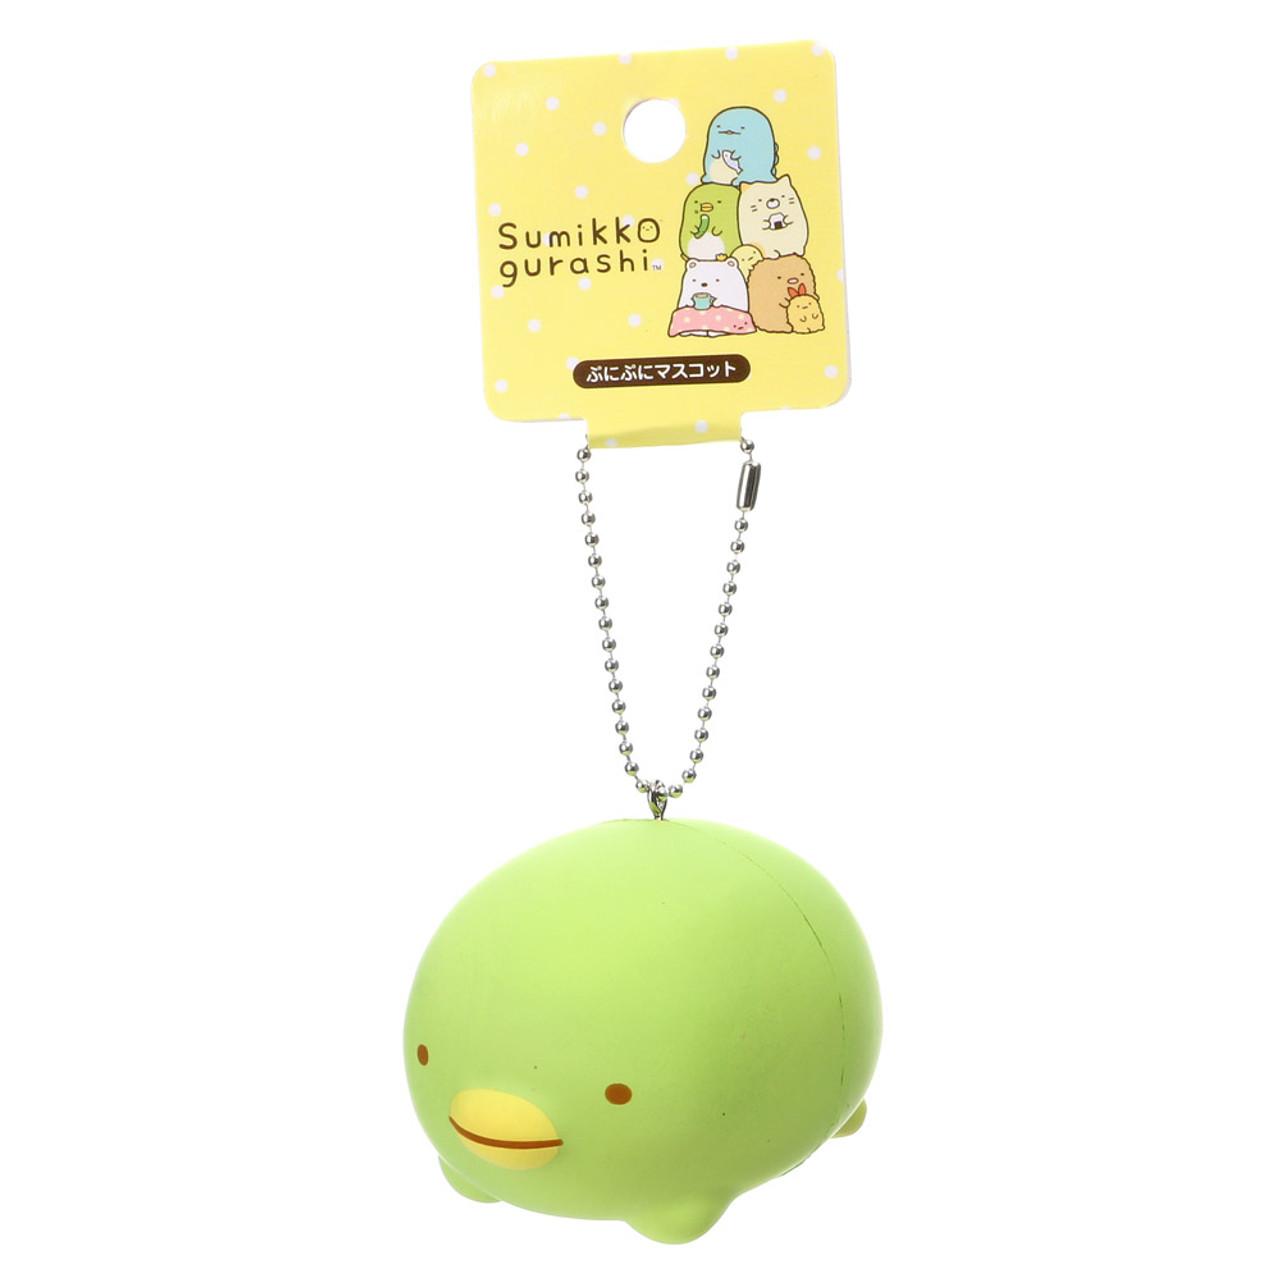 San-x Sumikko Gurashi Tsum Tsum Style Penguin Squishy Toy Charm ( Tag Front View )